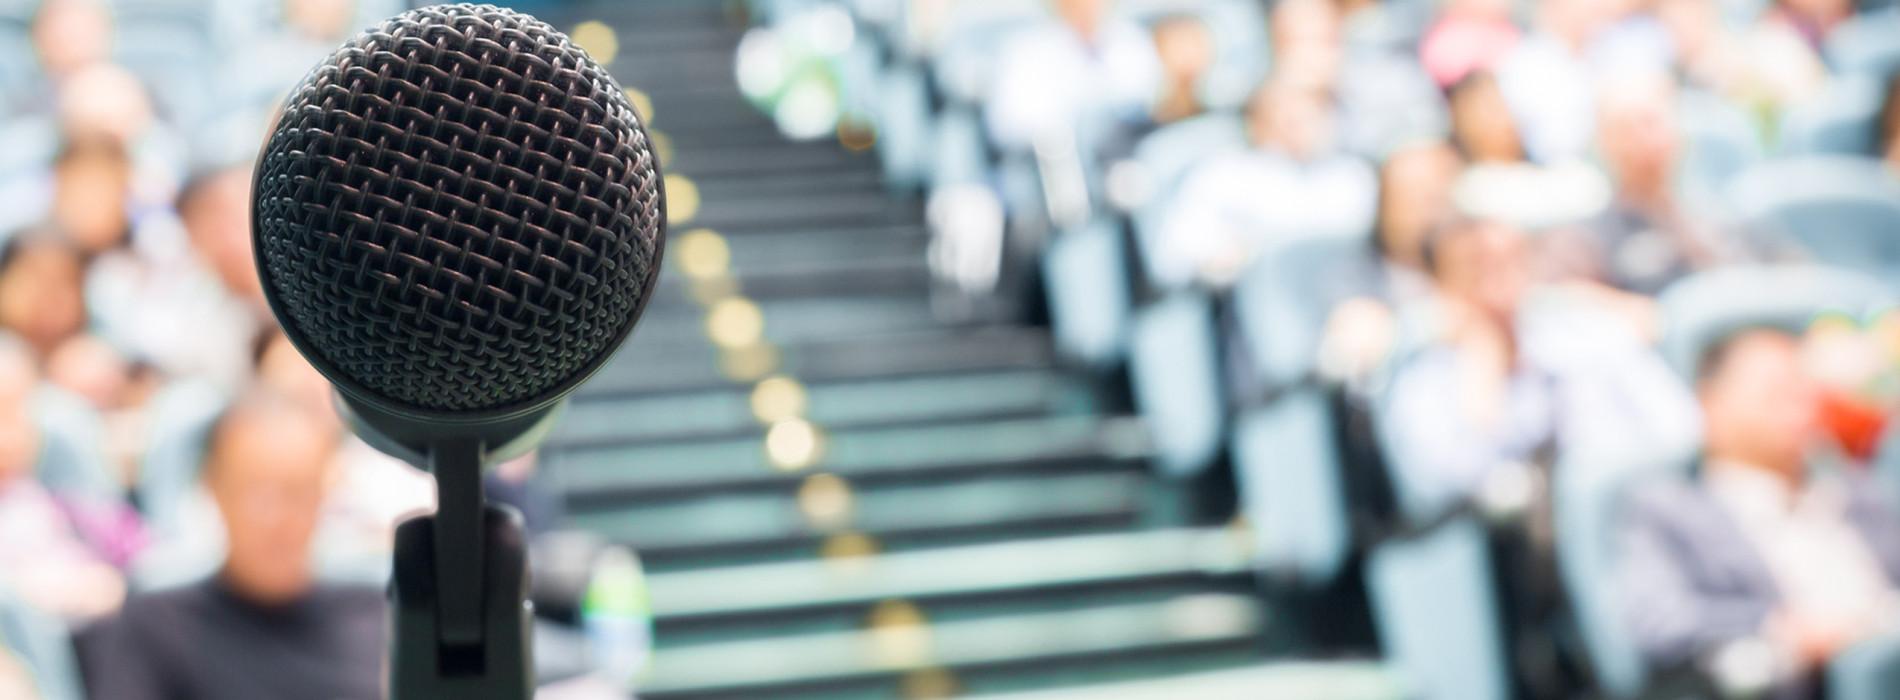 TSSA to Host First International Conference on Carbon Monoxide Risk Assessment & Management in November